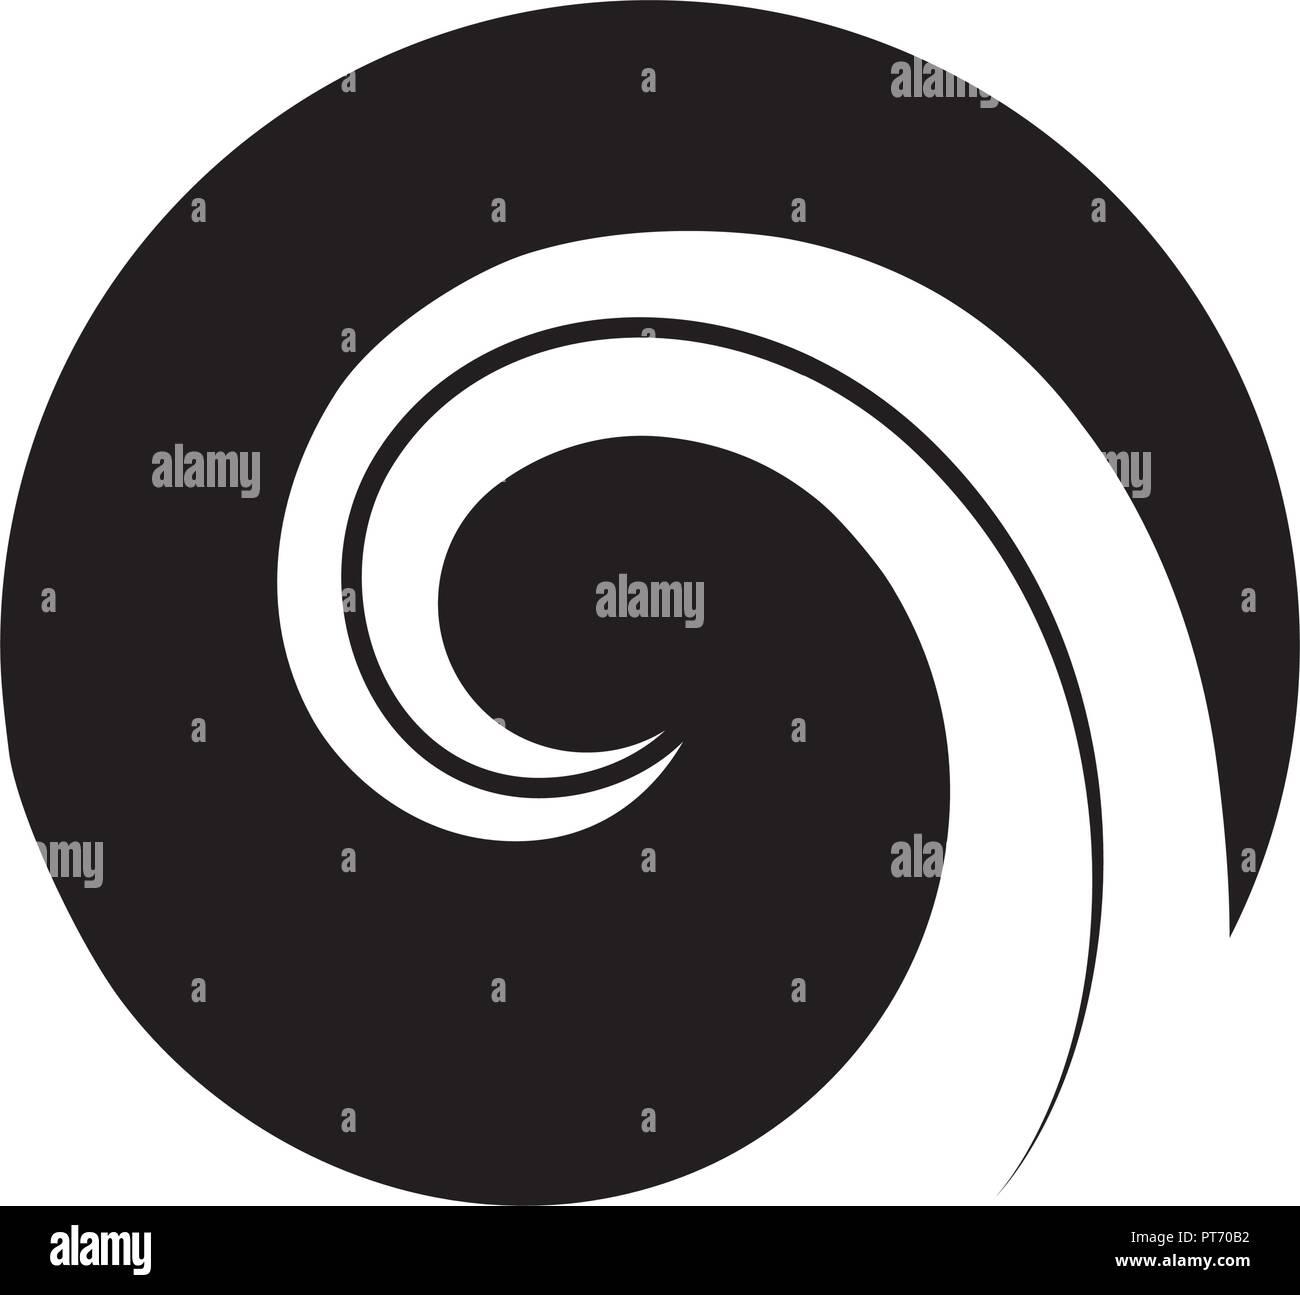 505edaf6aa5ef Koru. Maori symbol is a spiral shape based on silver fern frond - Stock  Vector